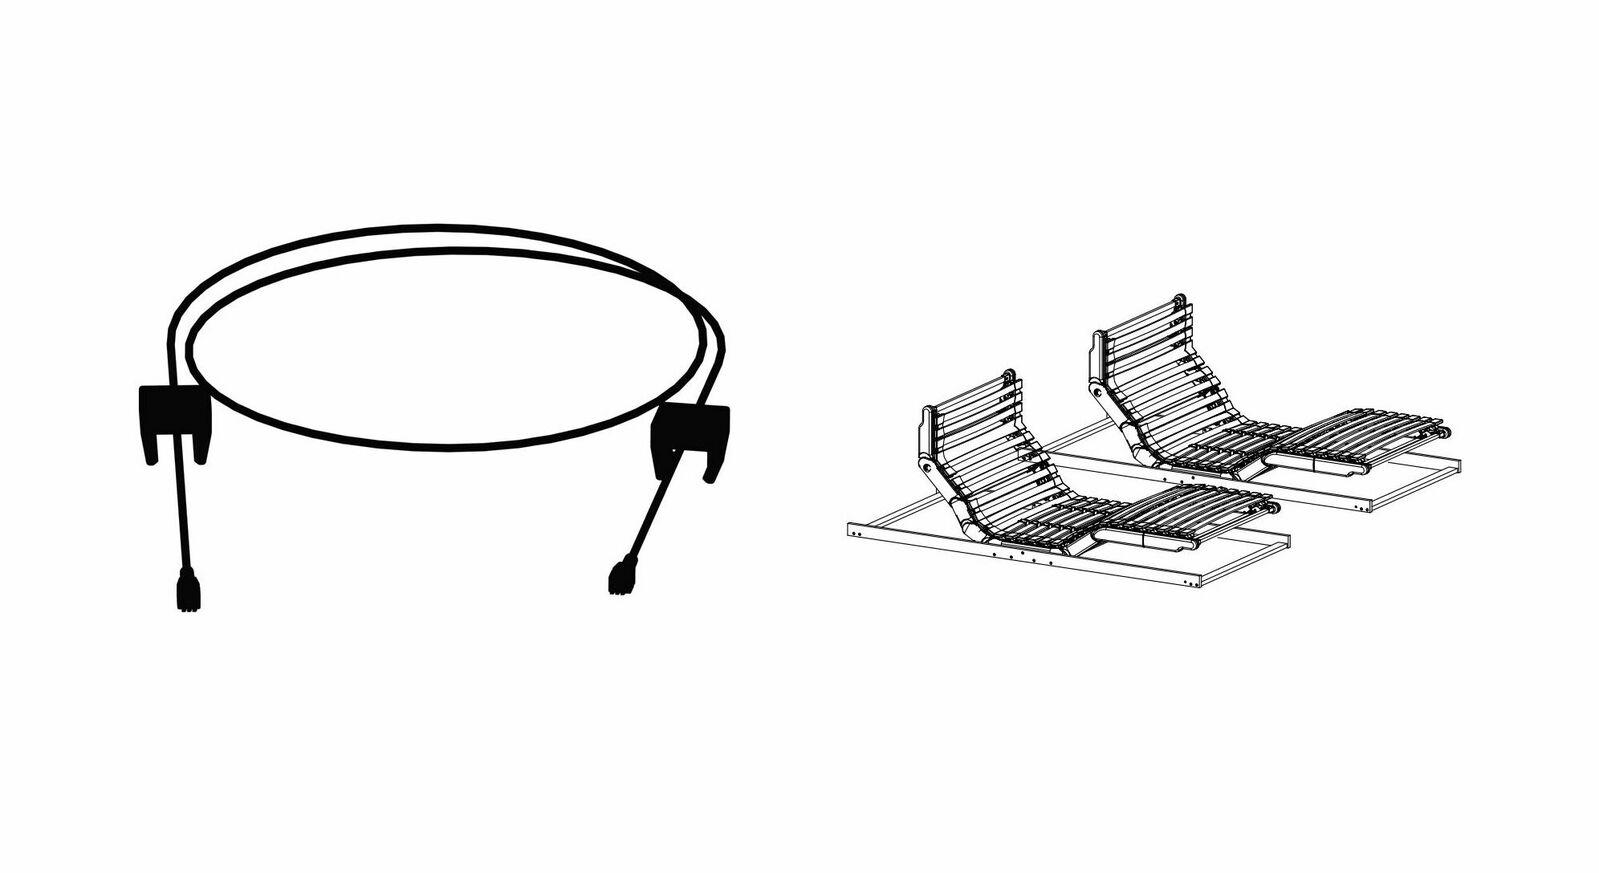 Synchro-Verbindung orthowell royalflex motor als Ergänzung zum Lattenrost